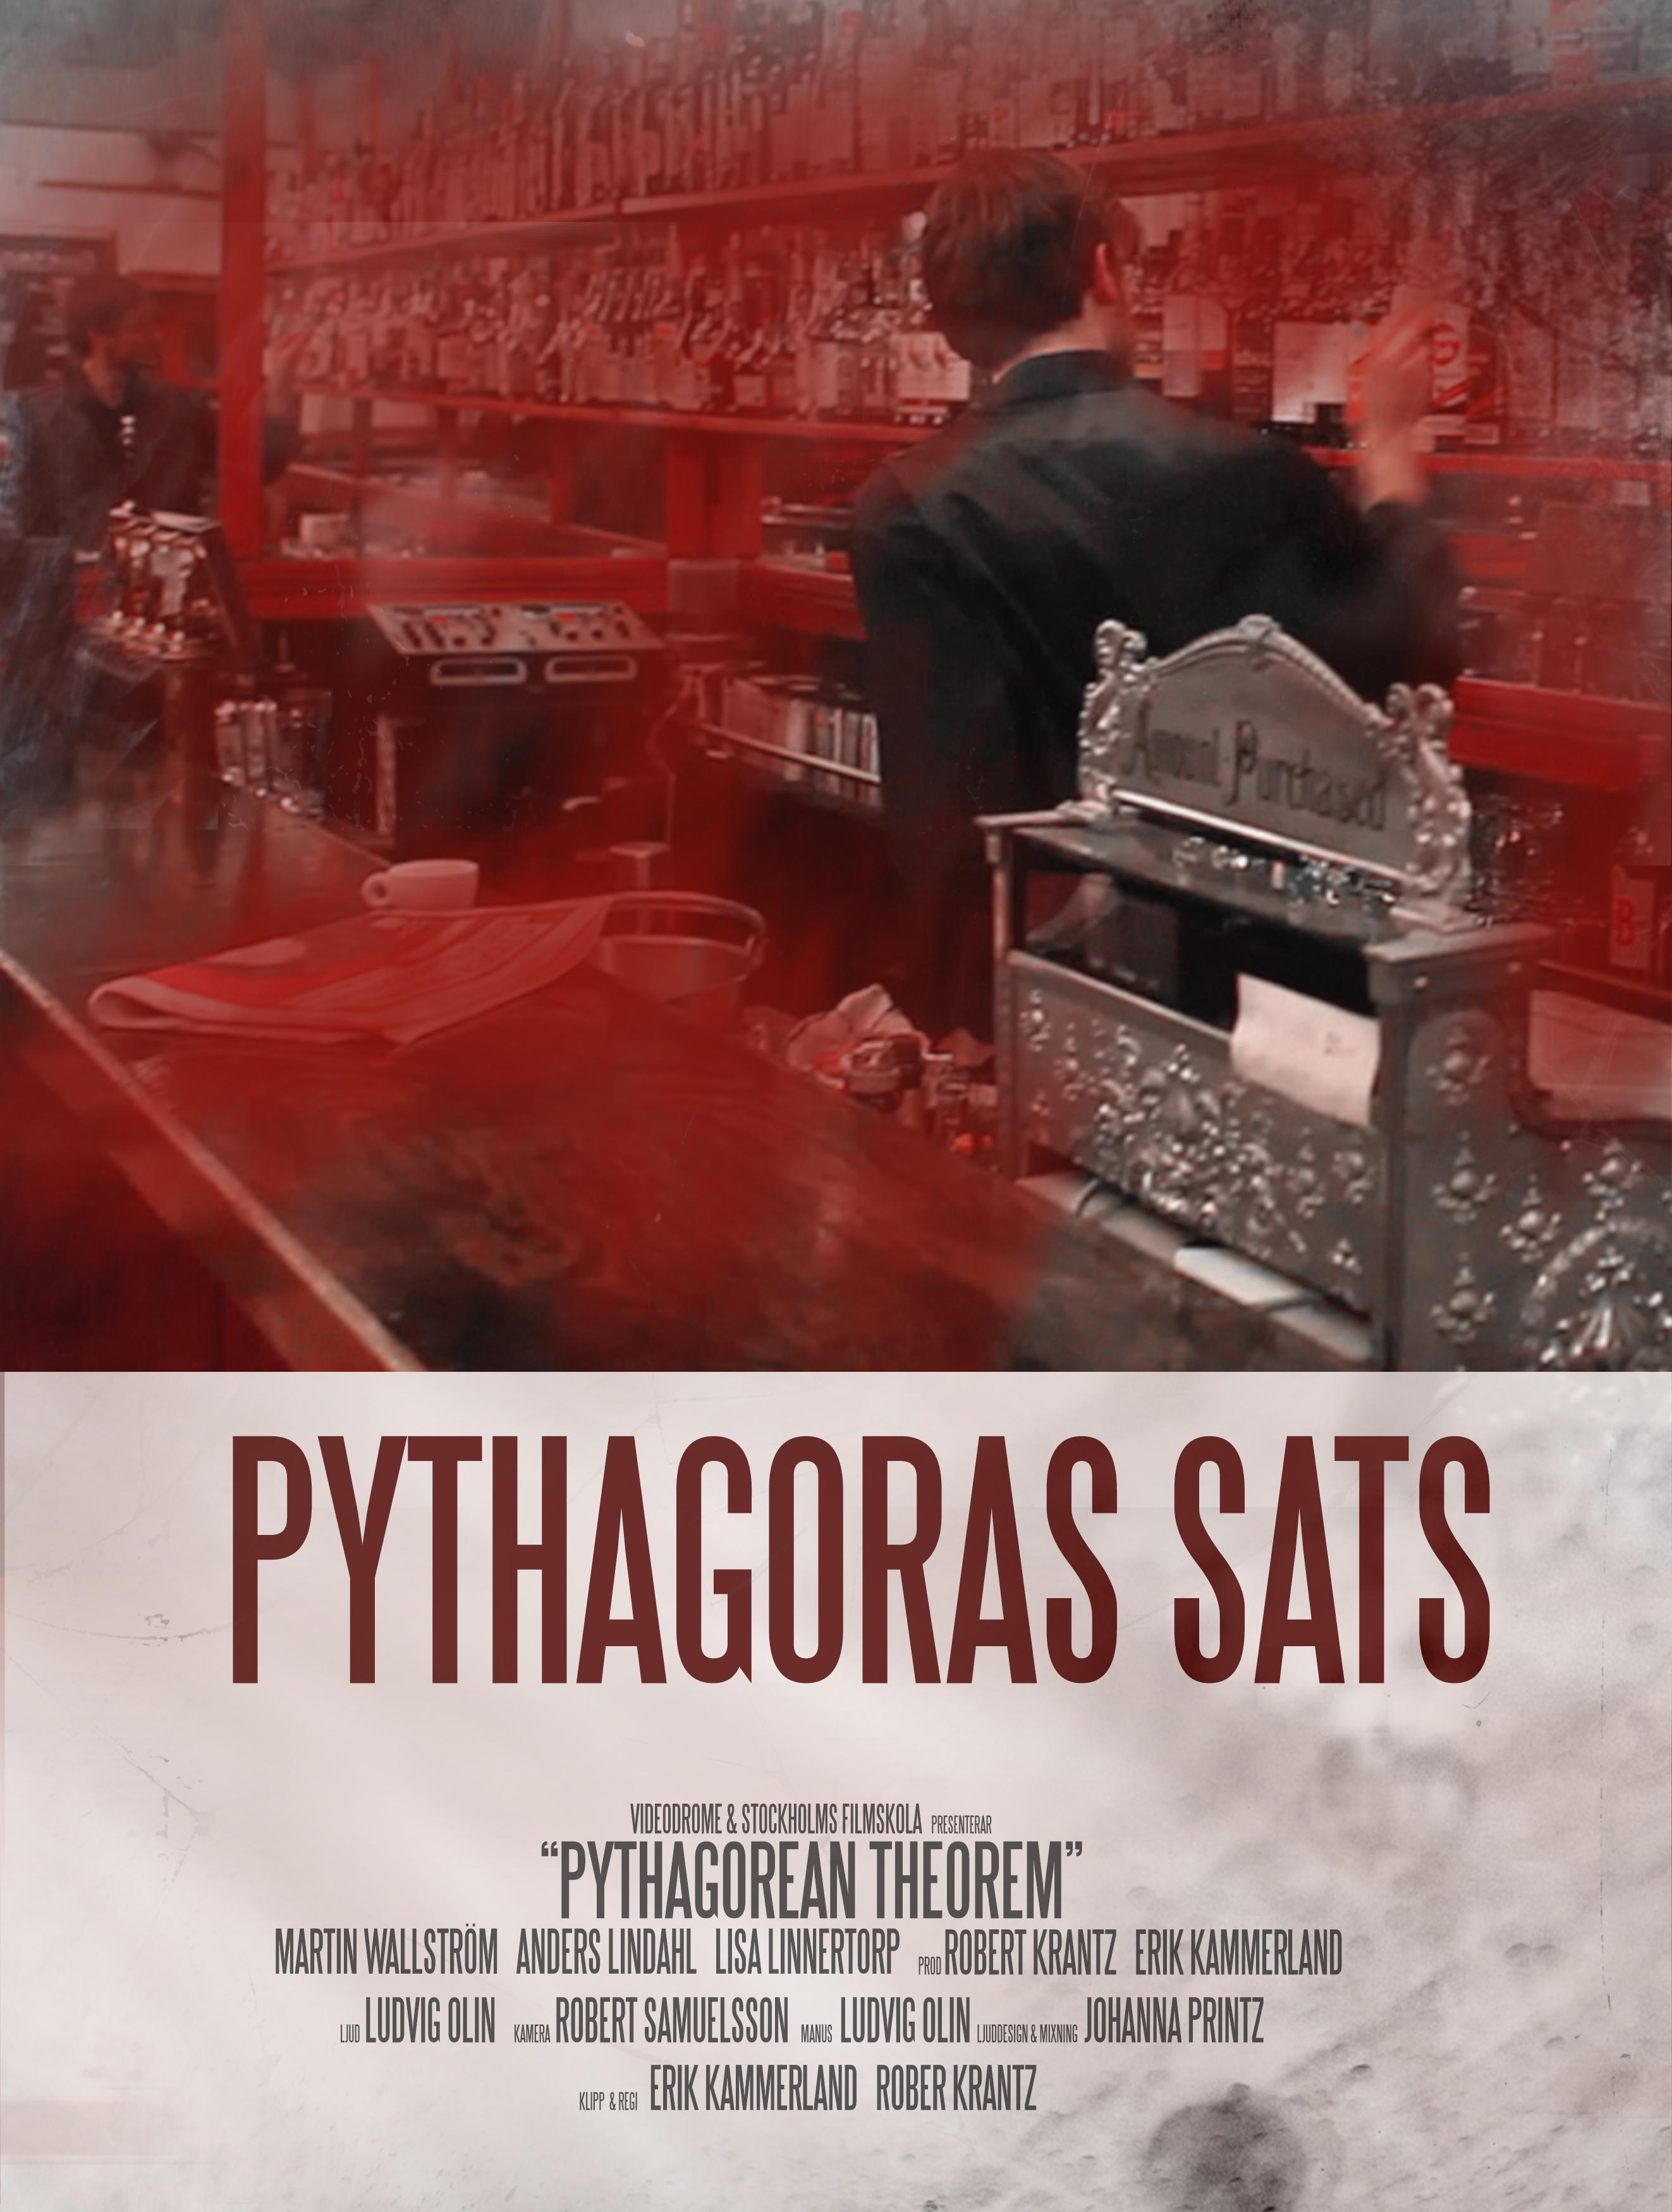 Pythagorean Theorem Video 2010 Imdb